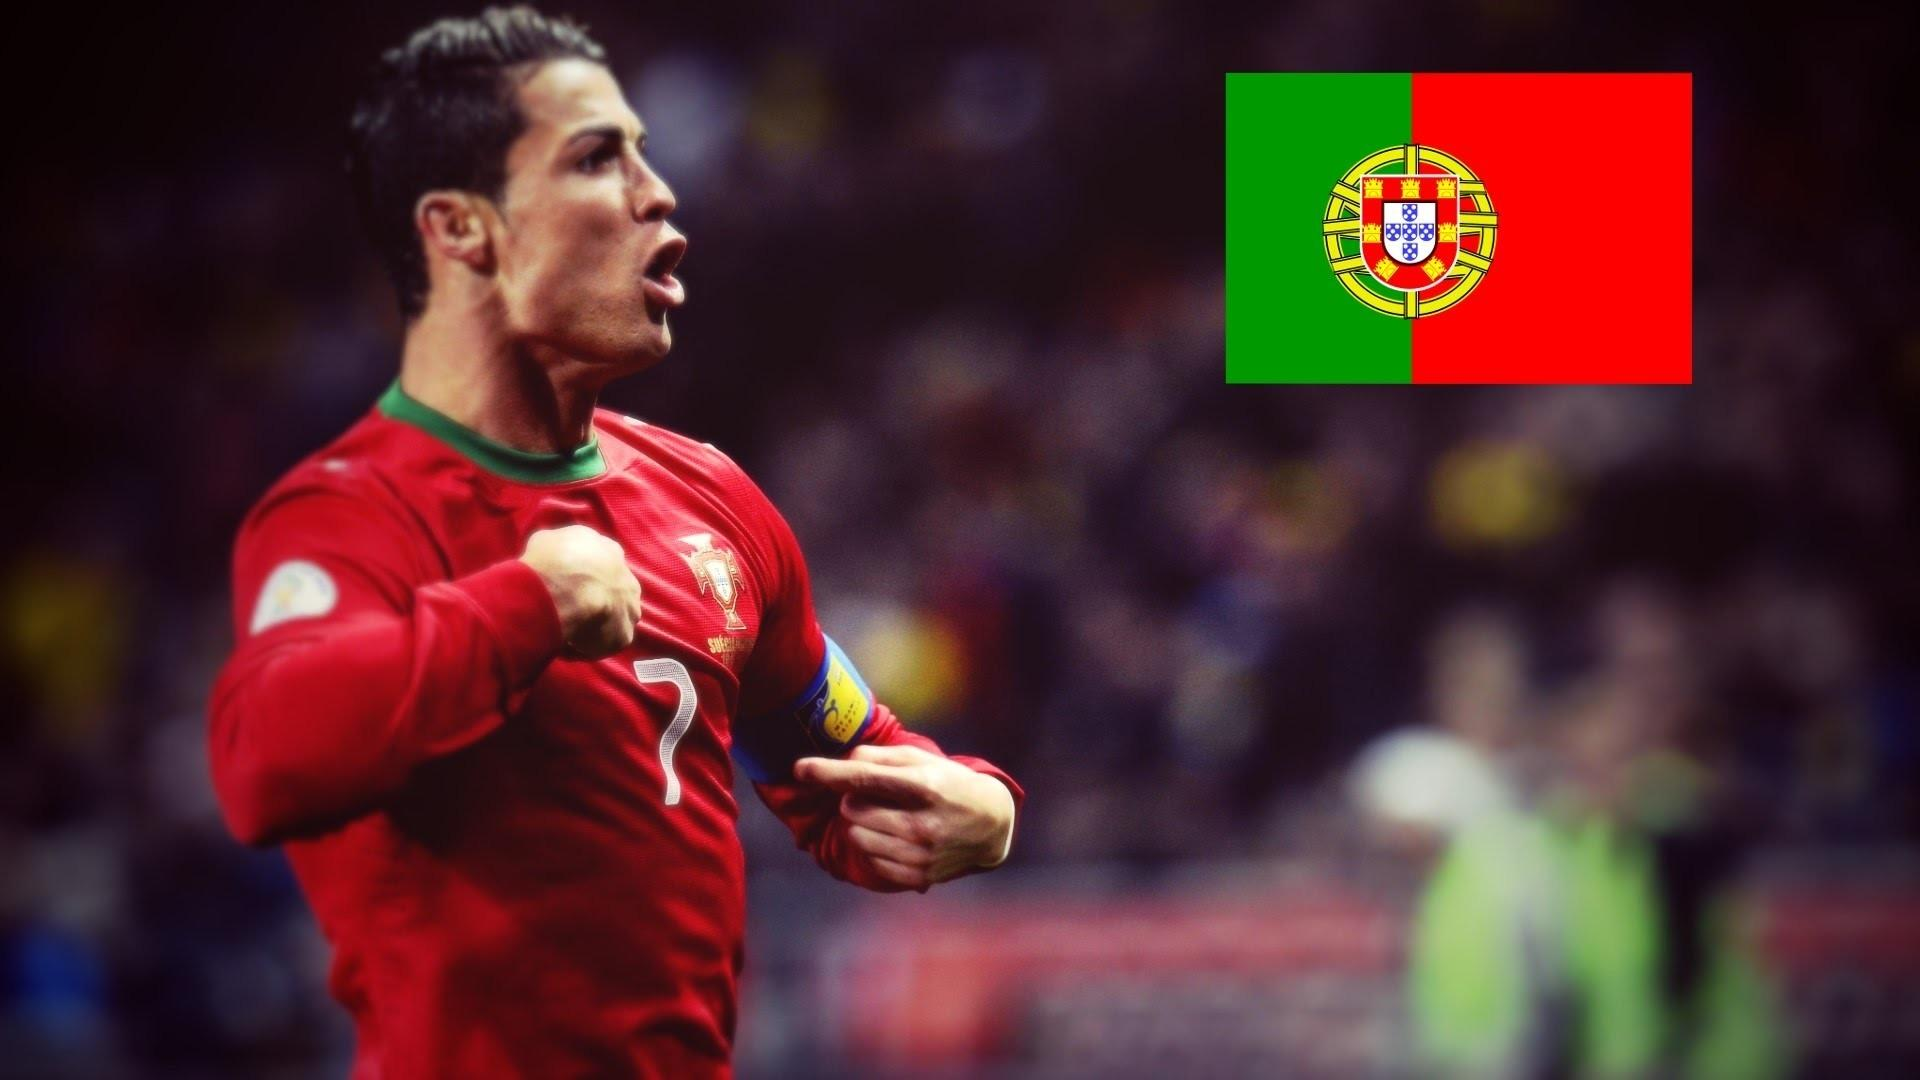 Cristiano Ronaldo 4k Wallpapers - Wallpaper Cave